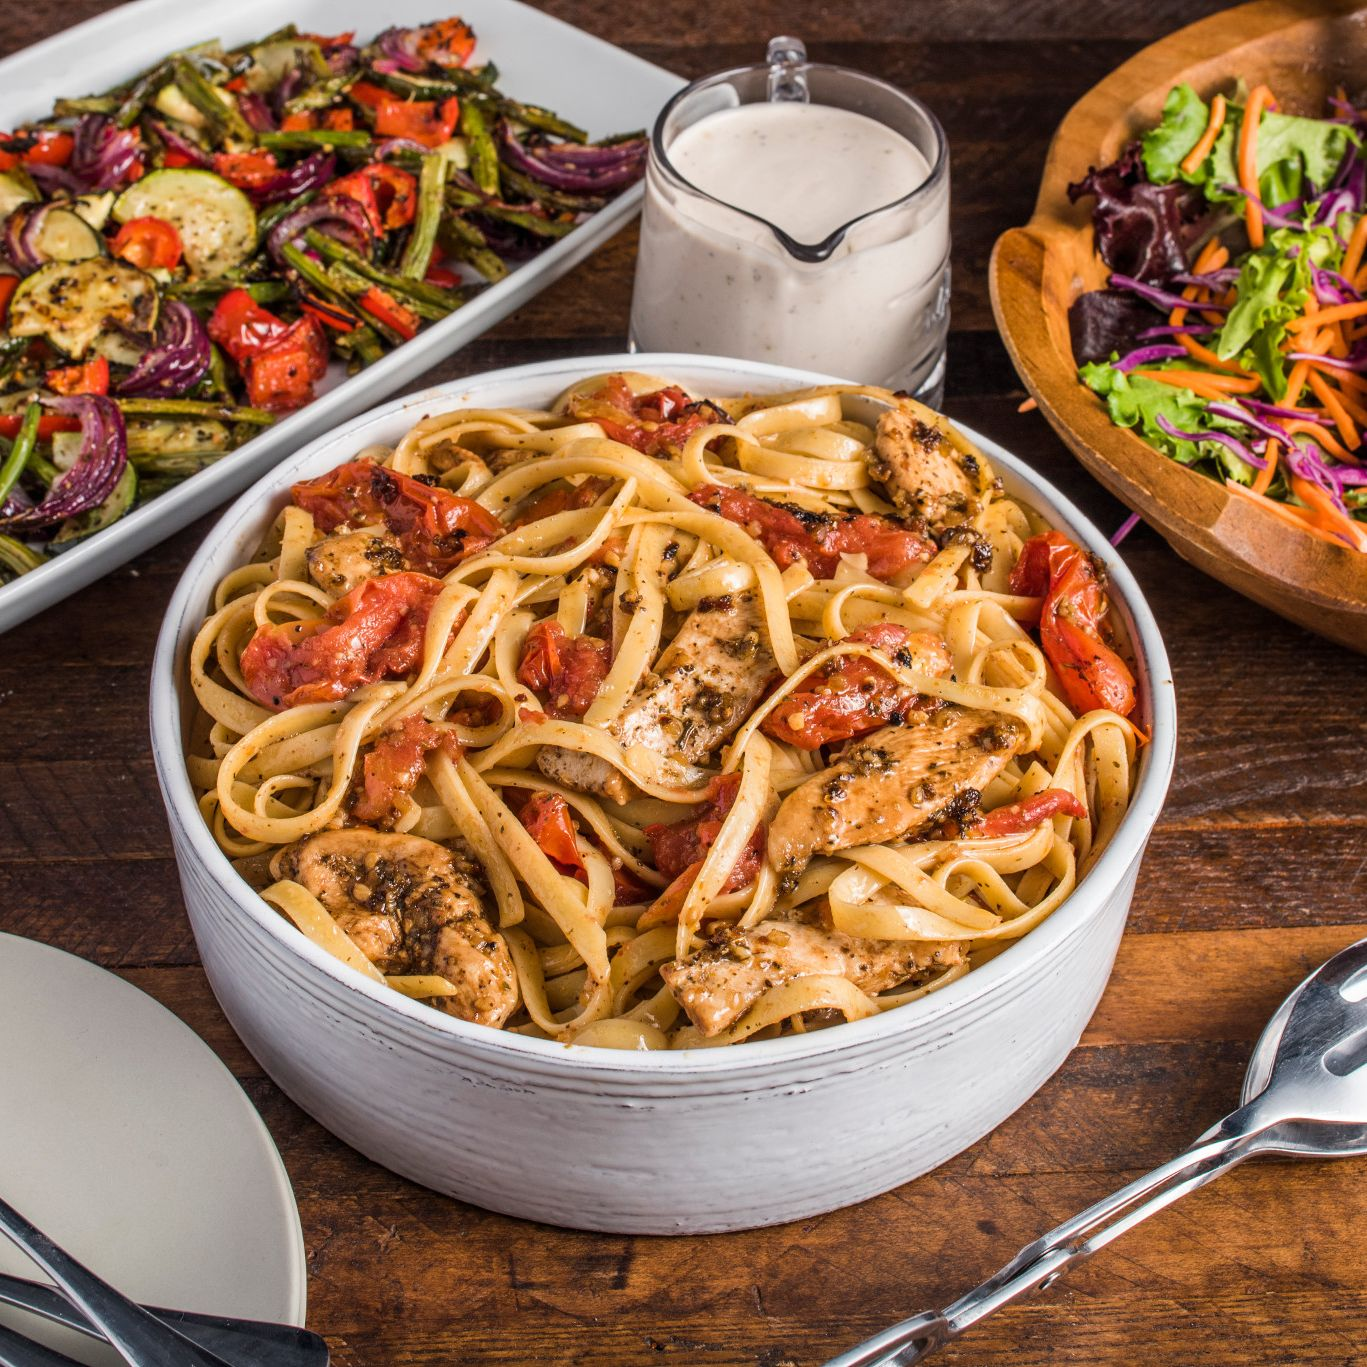 Mediterranean Complete Meal